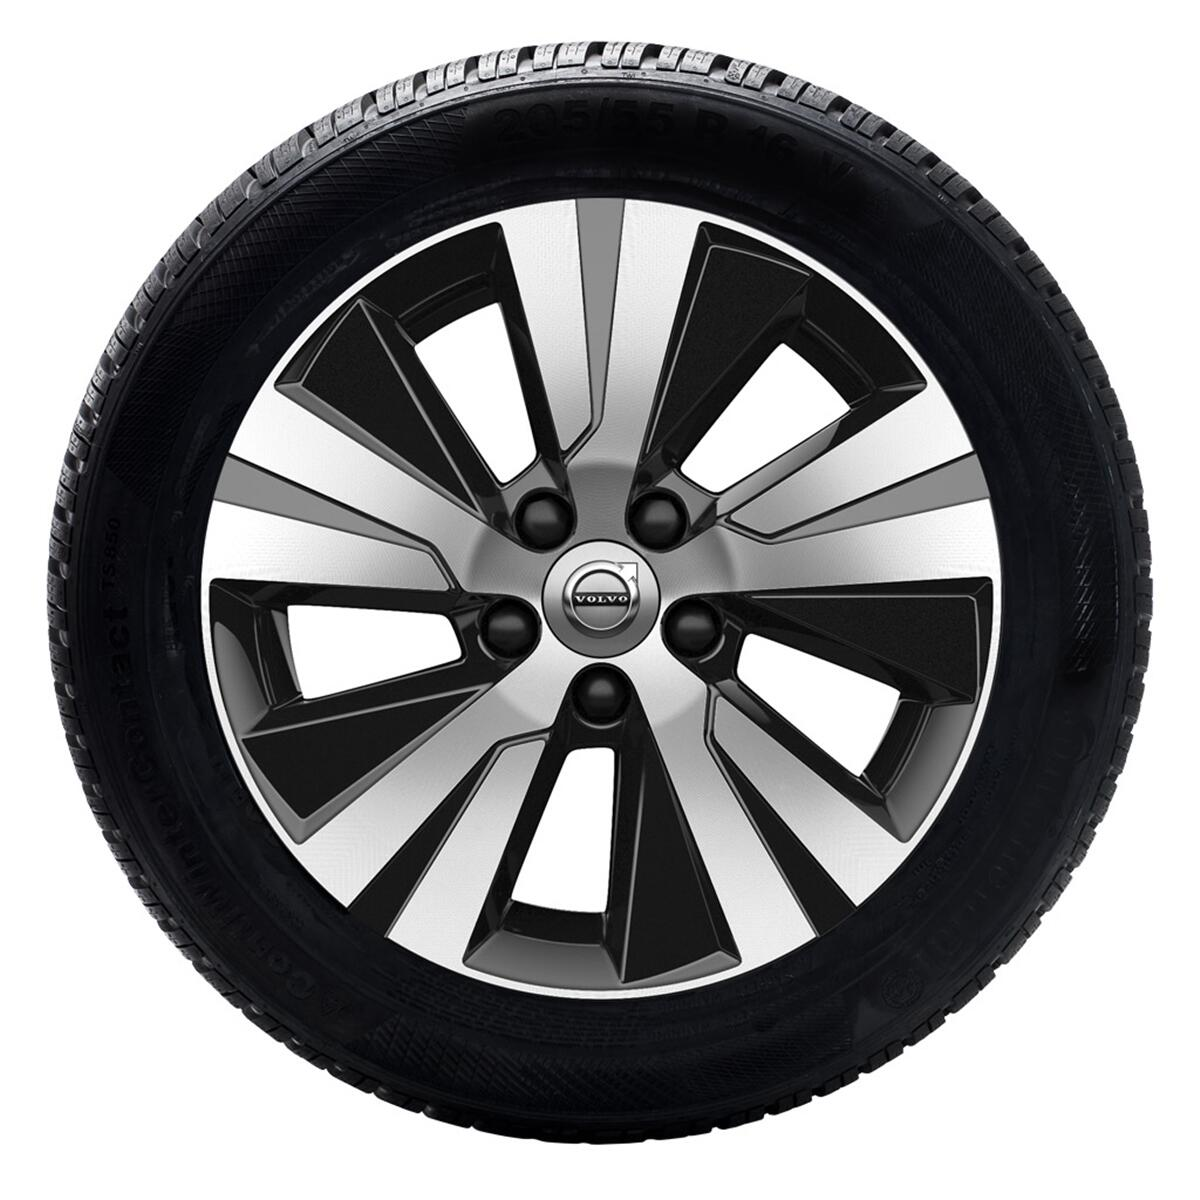 Komplet zimskih koles:  40,64 cm (16''), pnevmatike Michelin